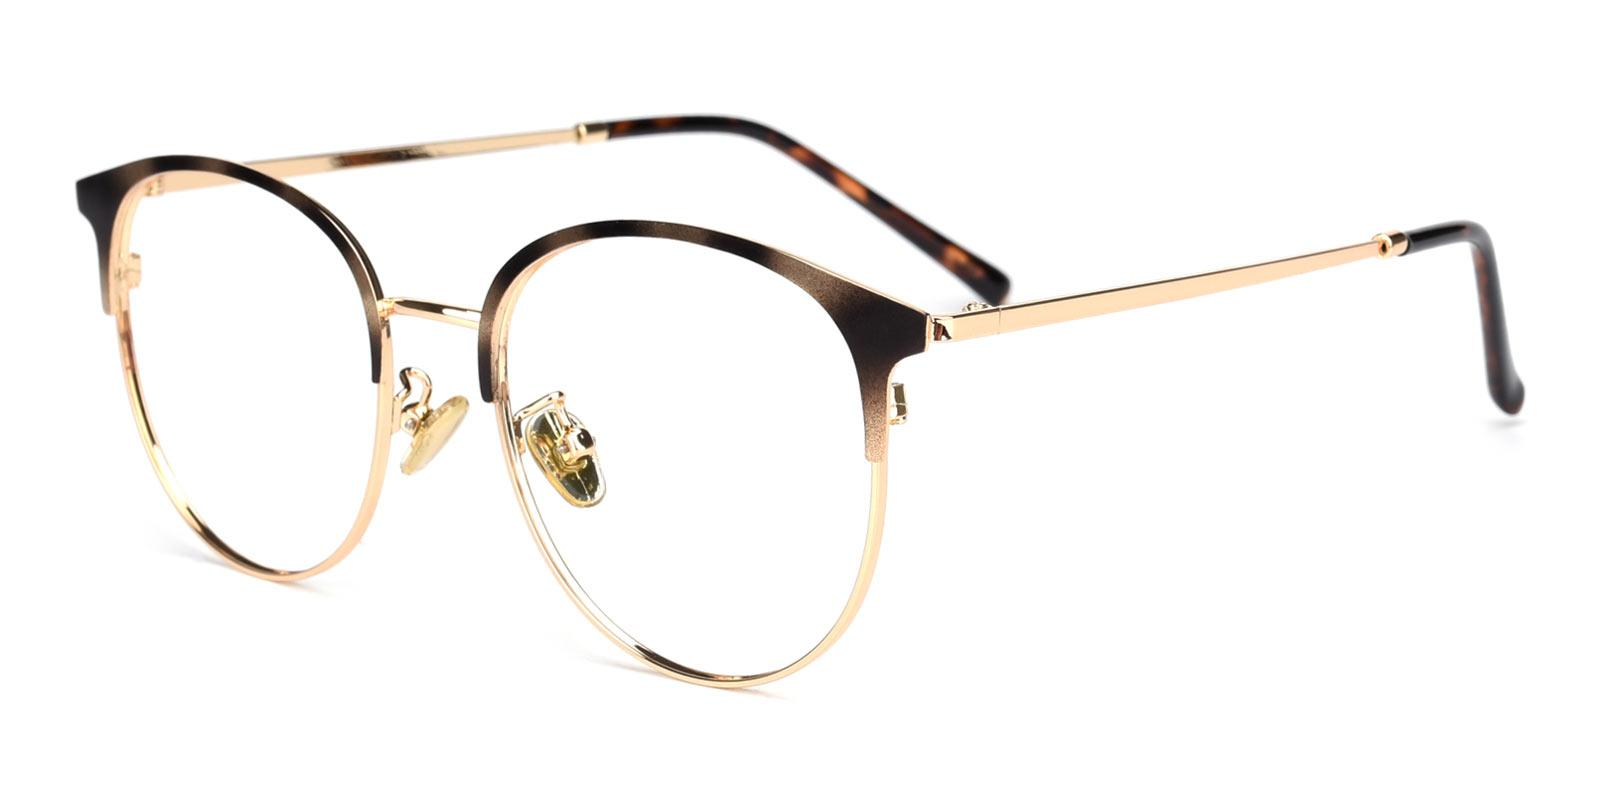 Knight-Tortoise-Browline-Metal-Eyeglasses-detail